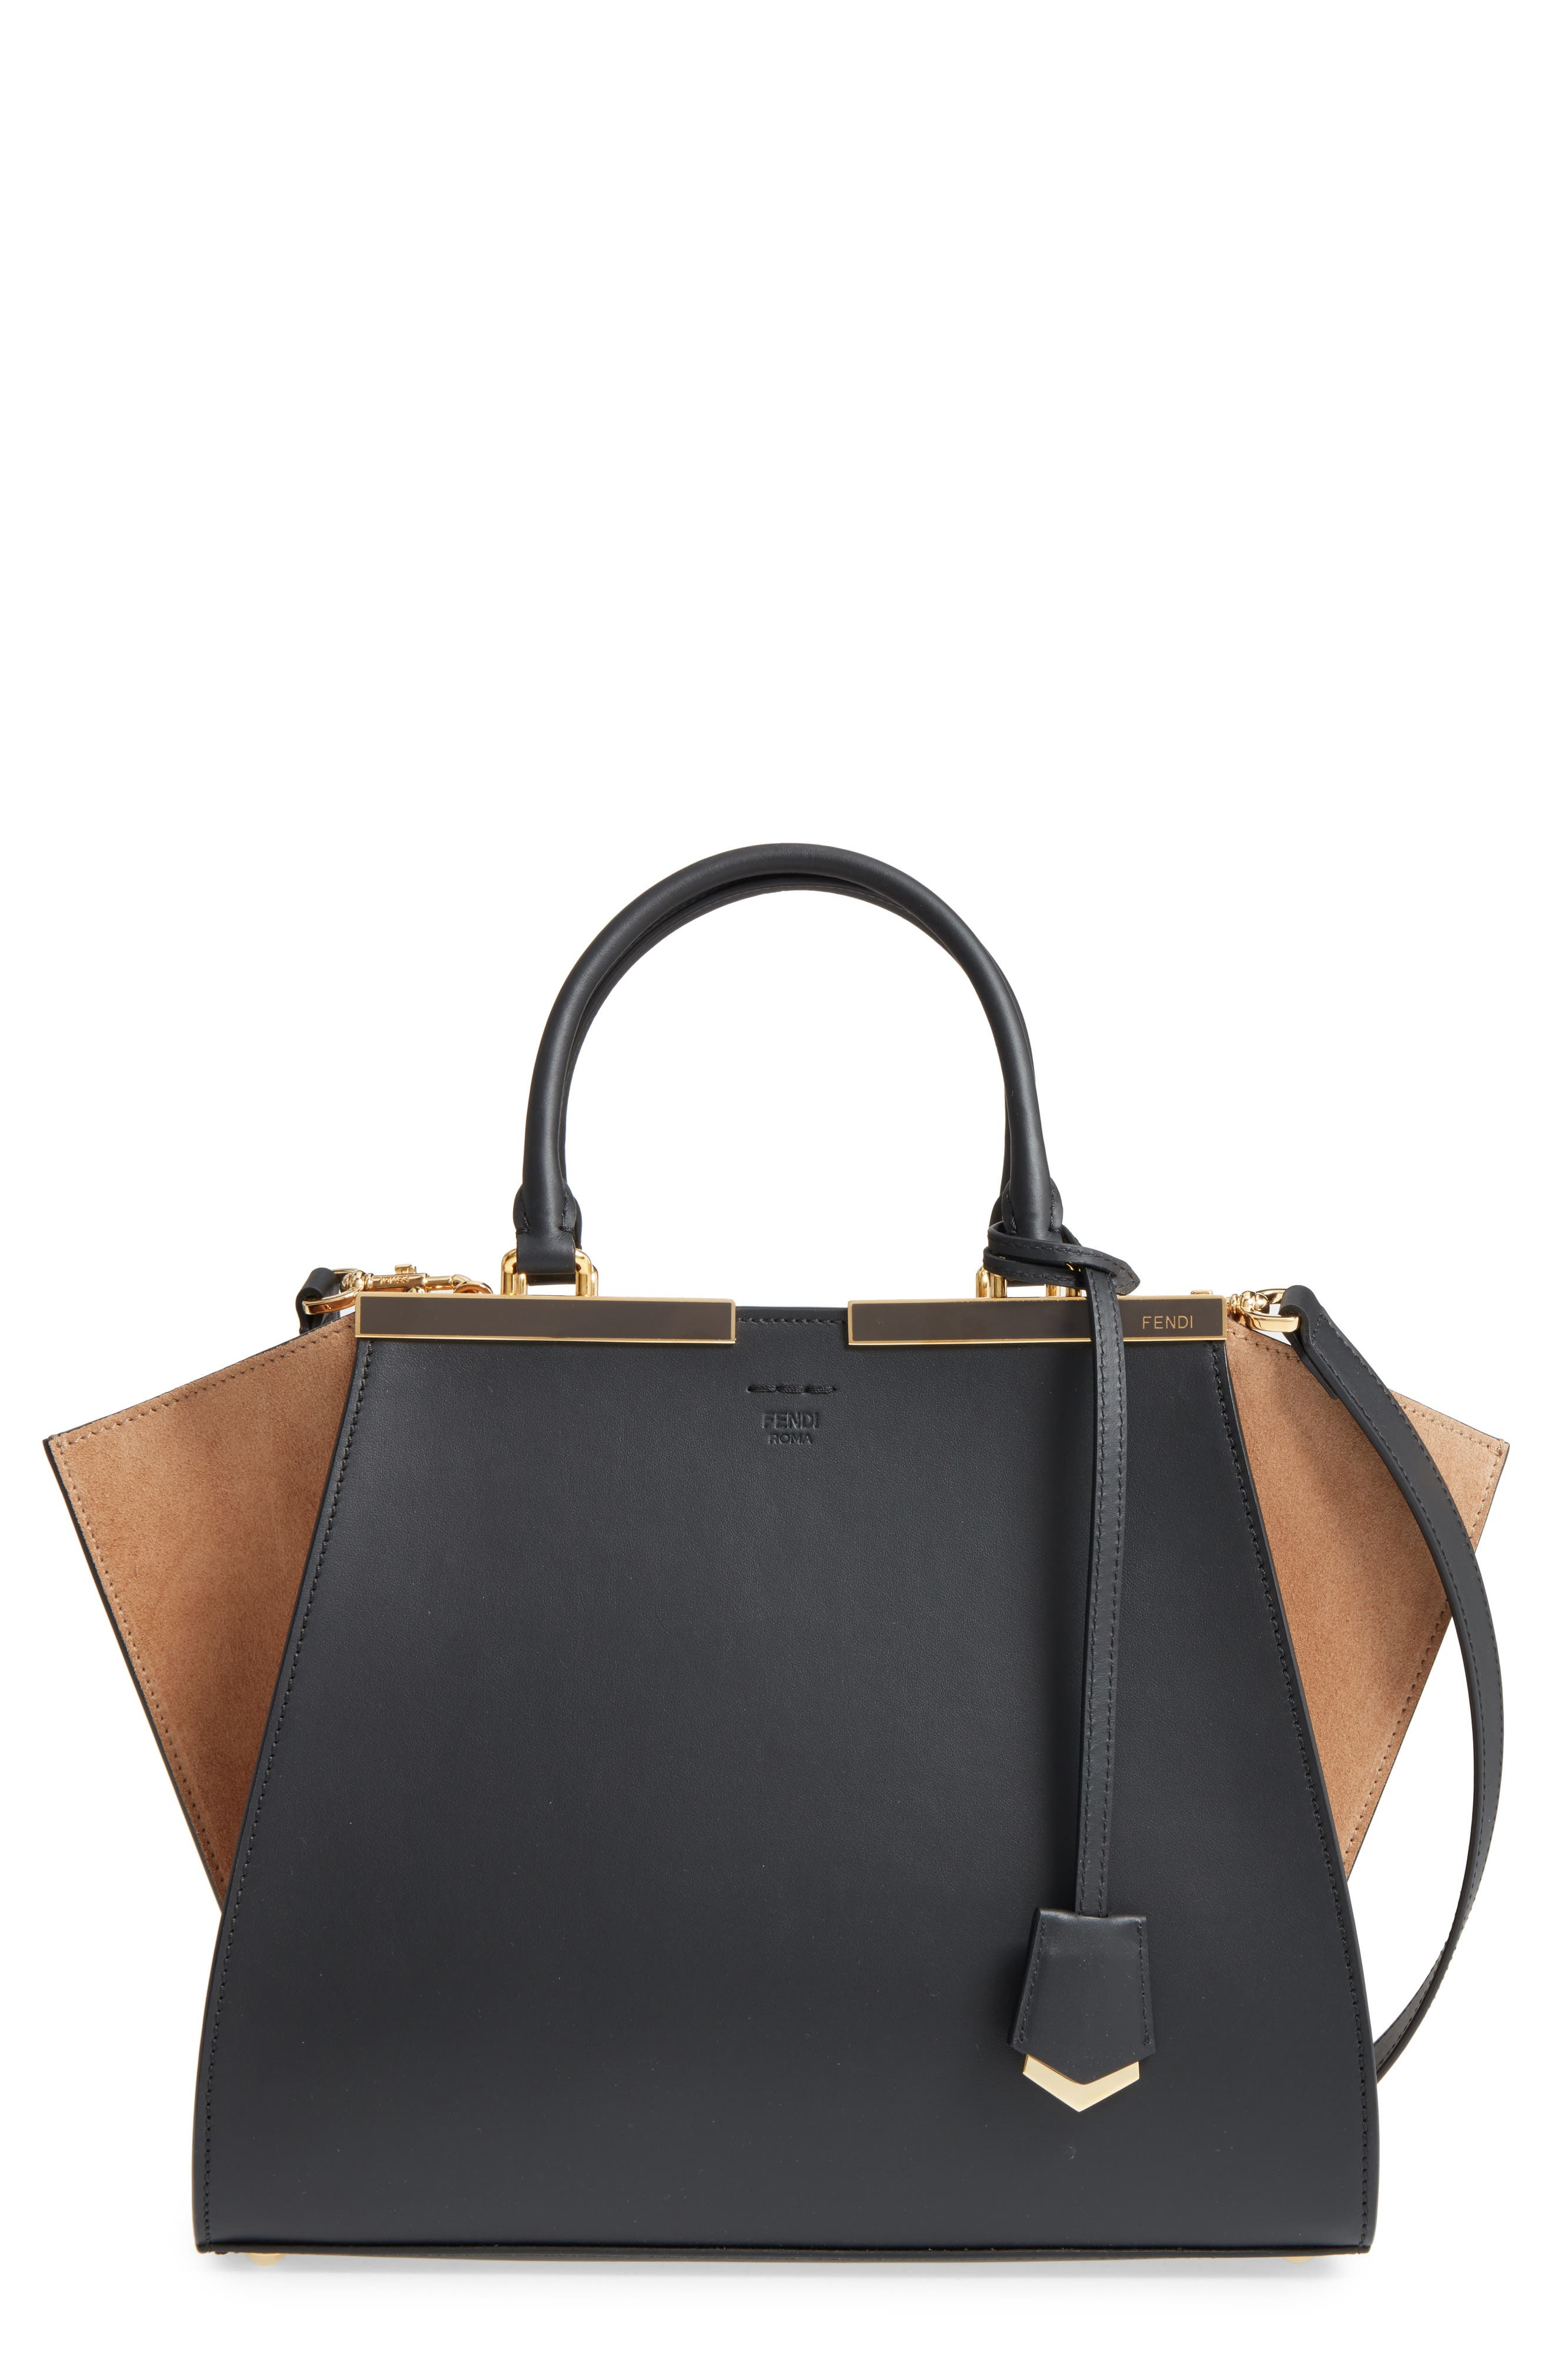 3Jours Leather & Suede Shopper,                         Main,                         color, Black/ Brown